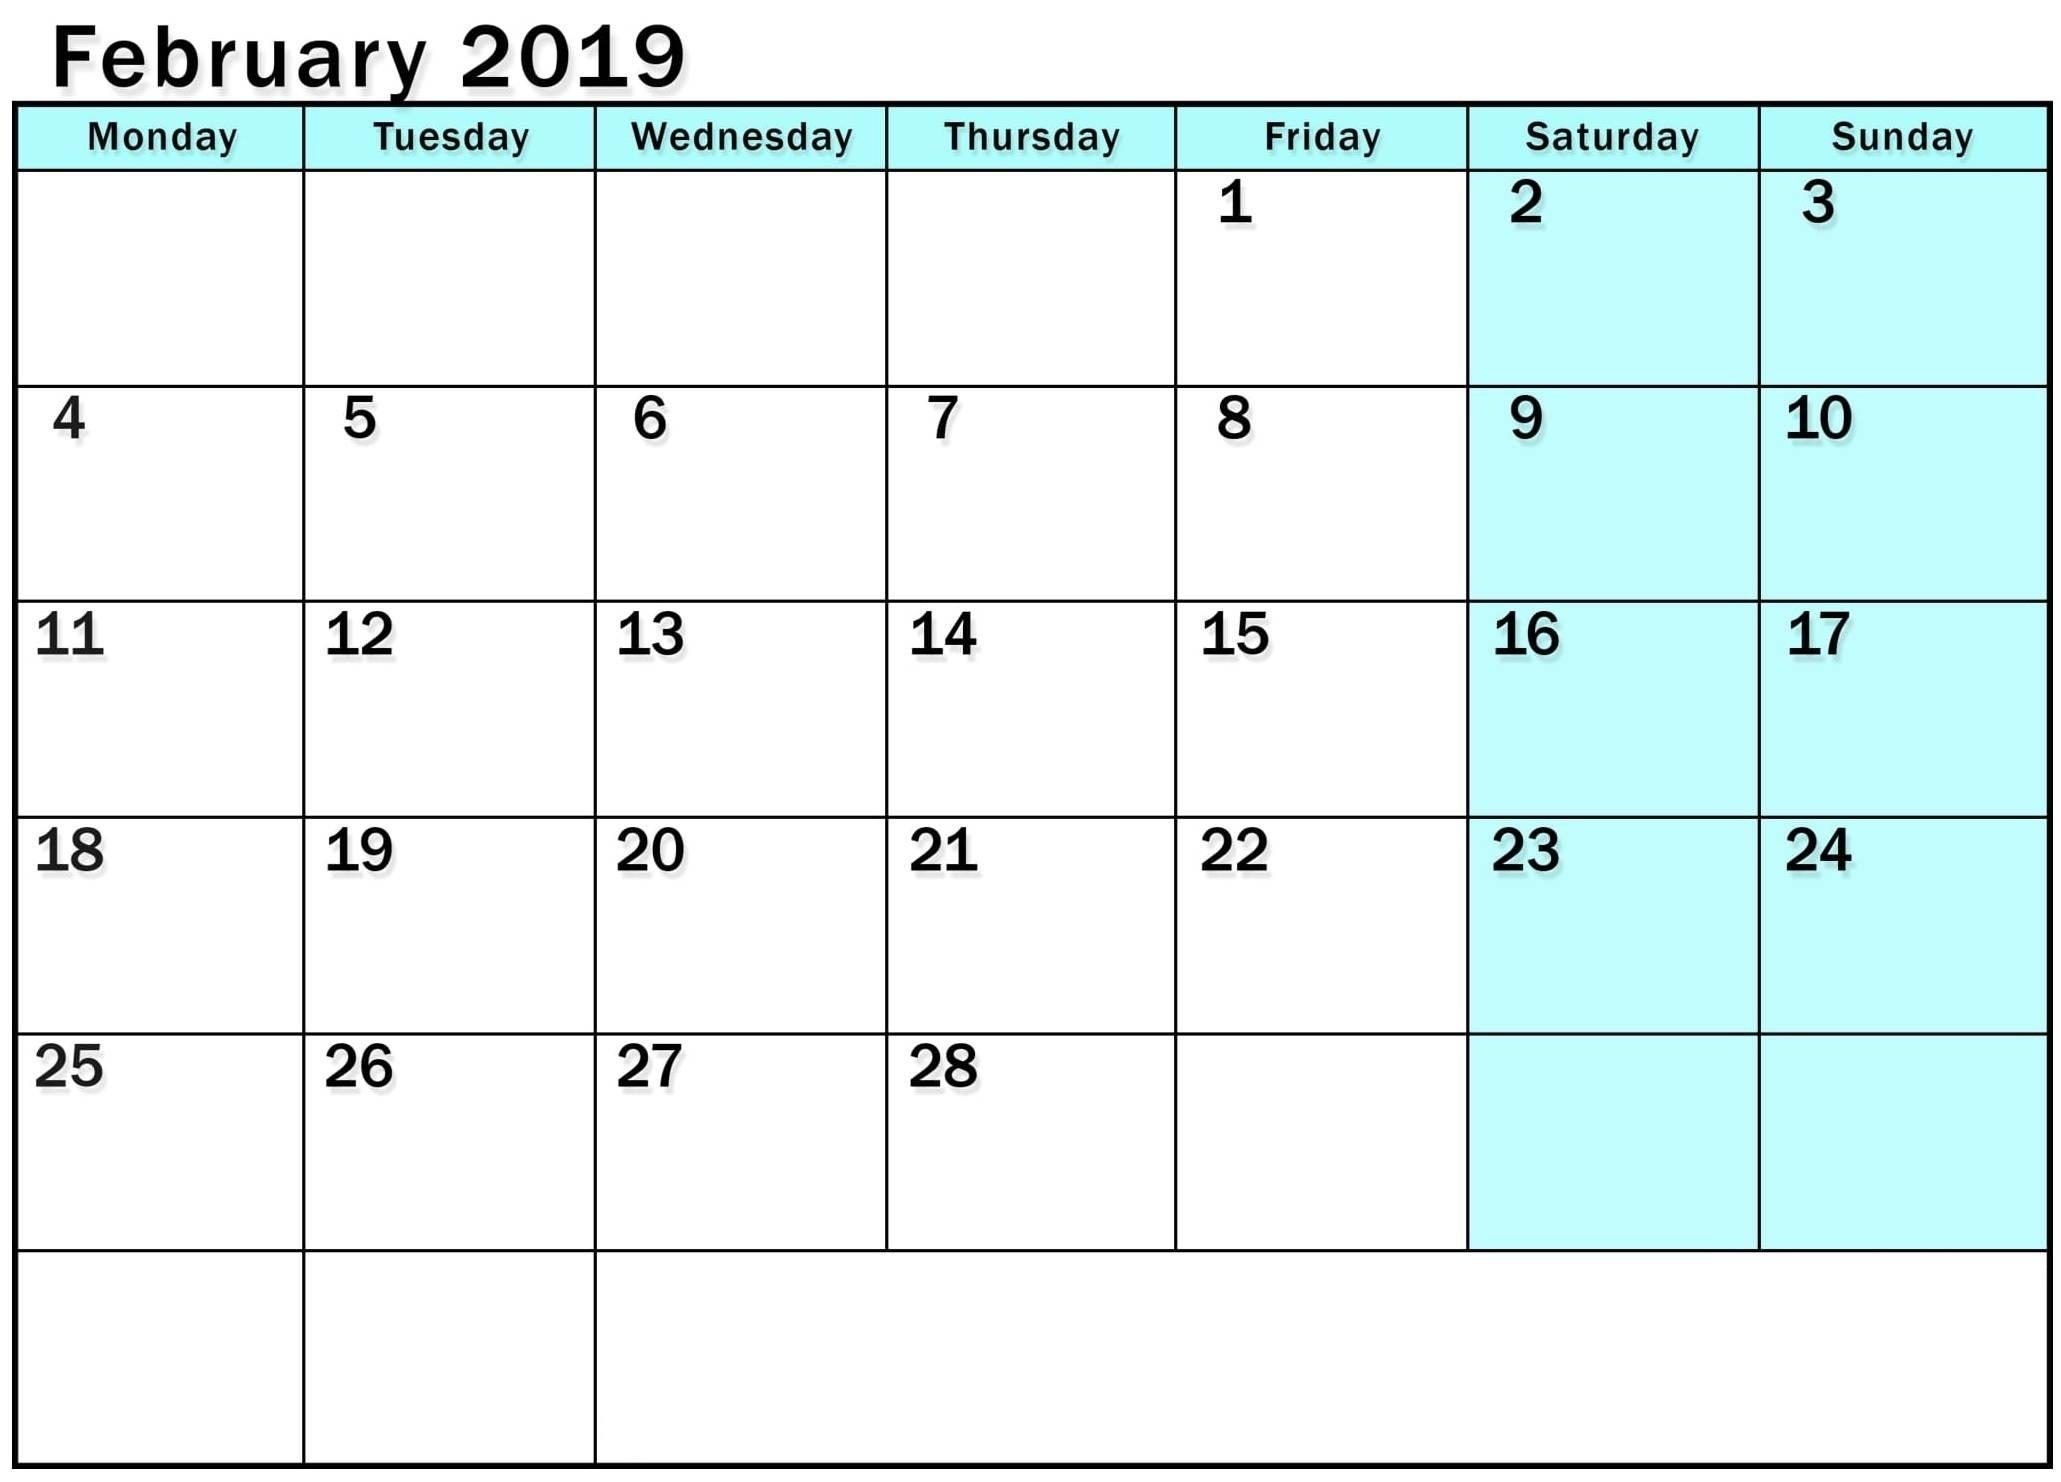 2019 Monday Through Sunday Calendar - Template Calendar Design